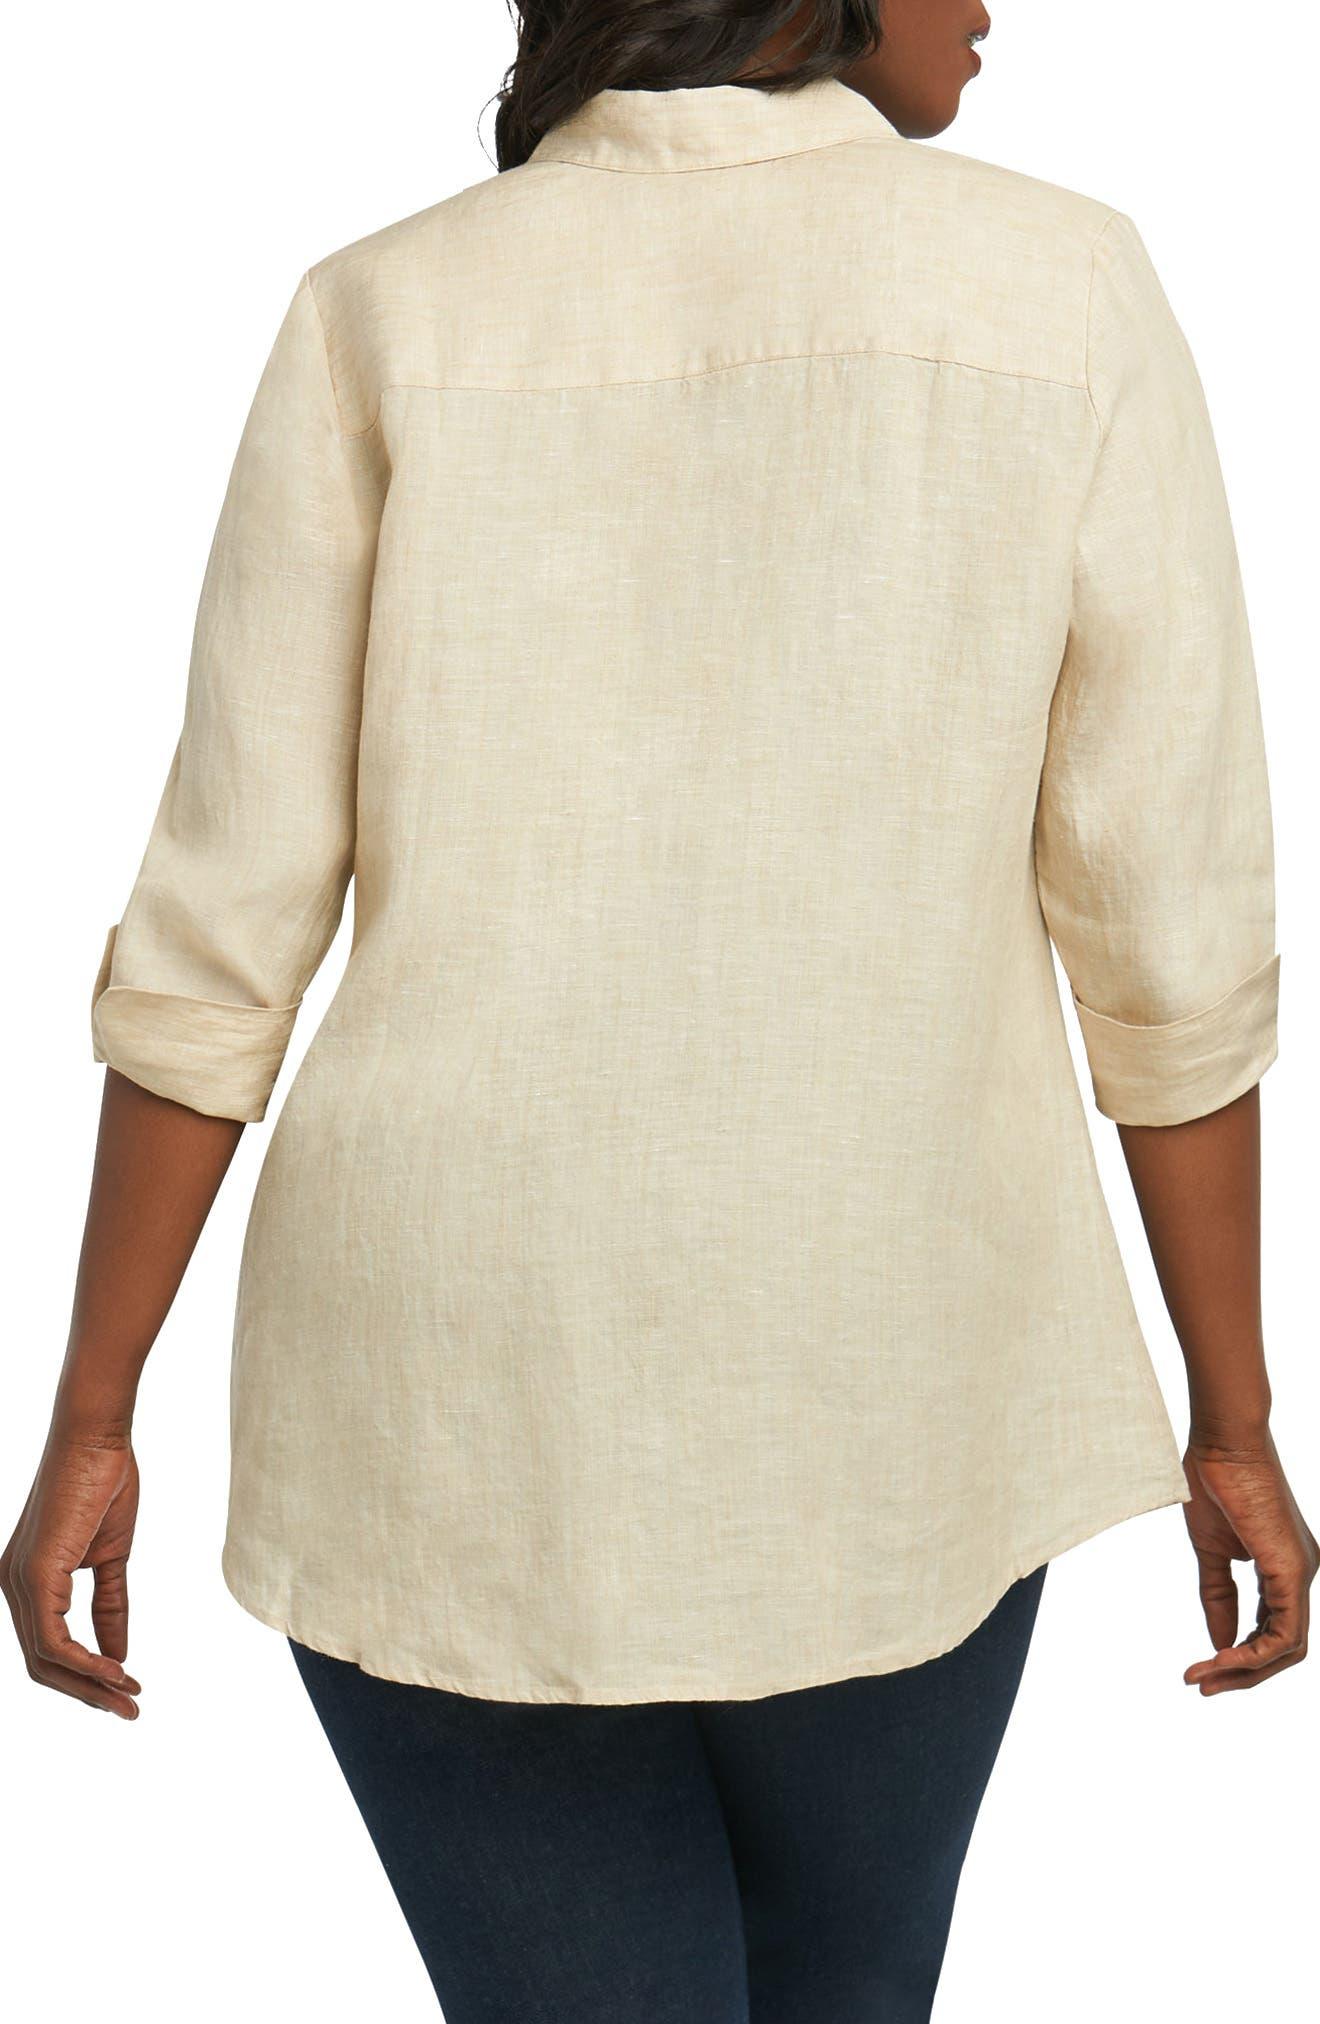 Cici Linen Chambray Shirt,                             Alternate thumbnail 2, color,                             275